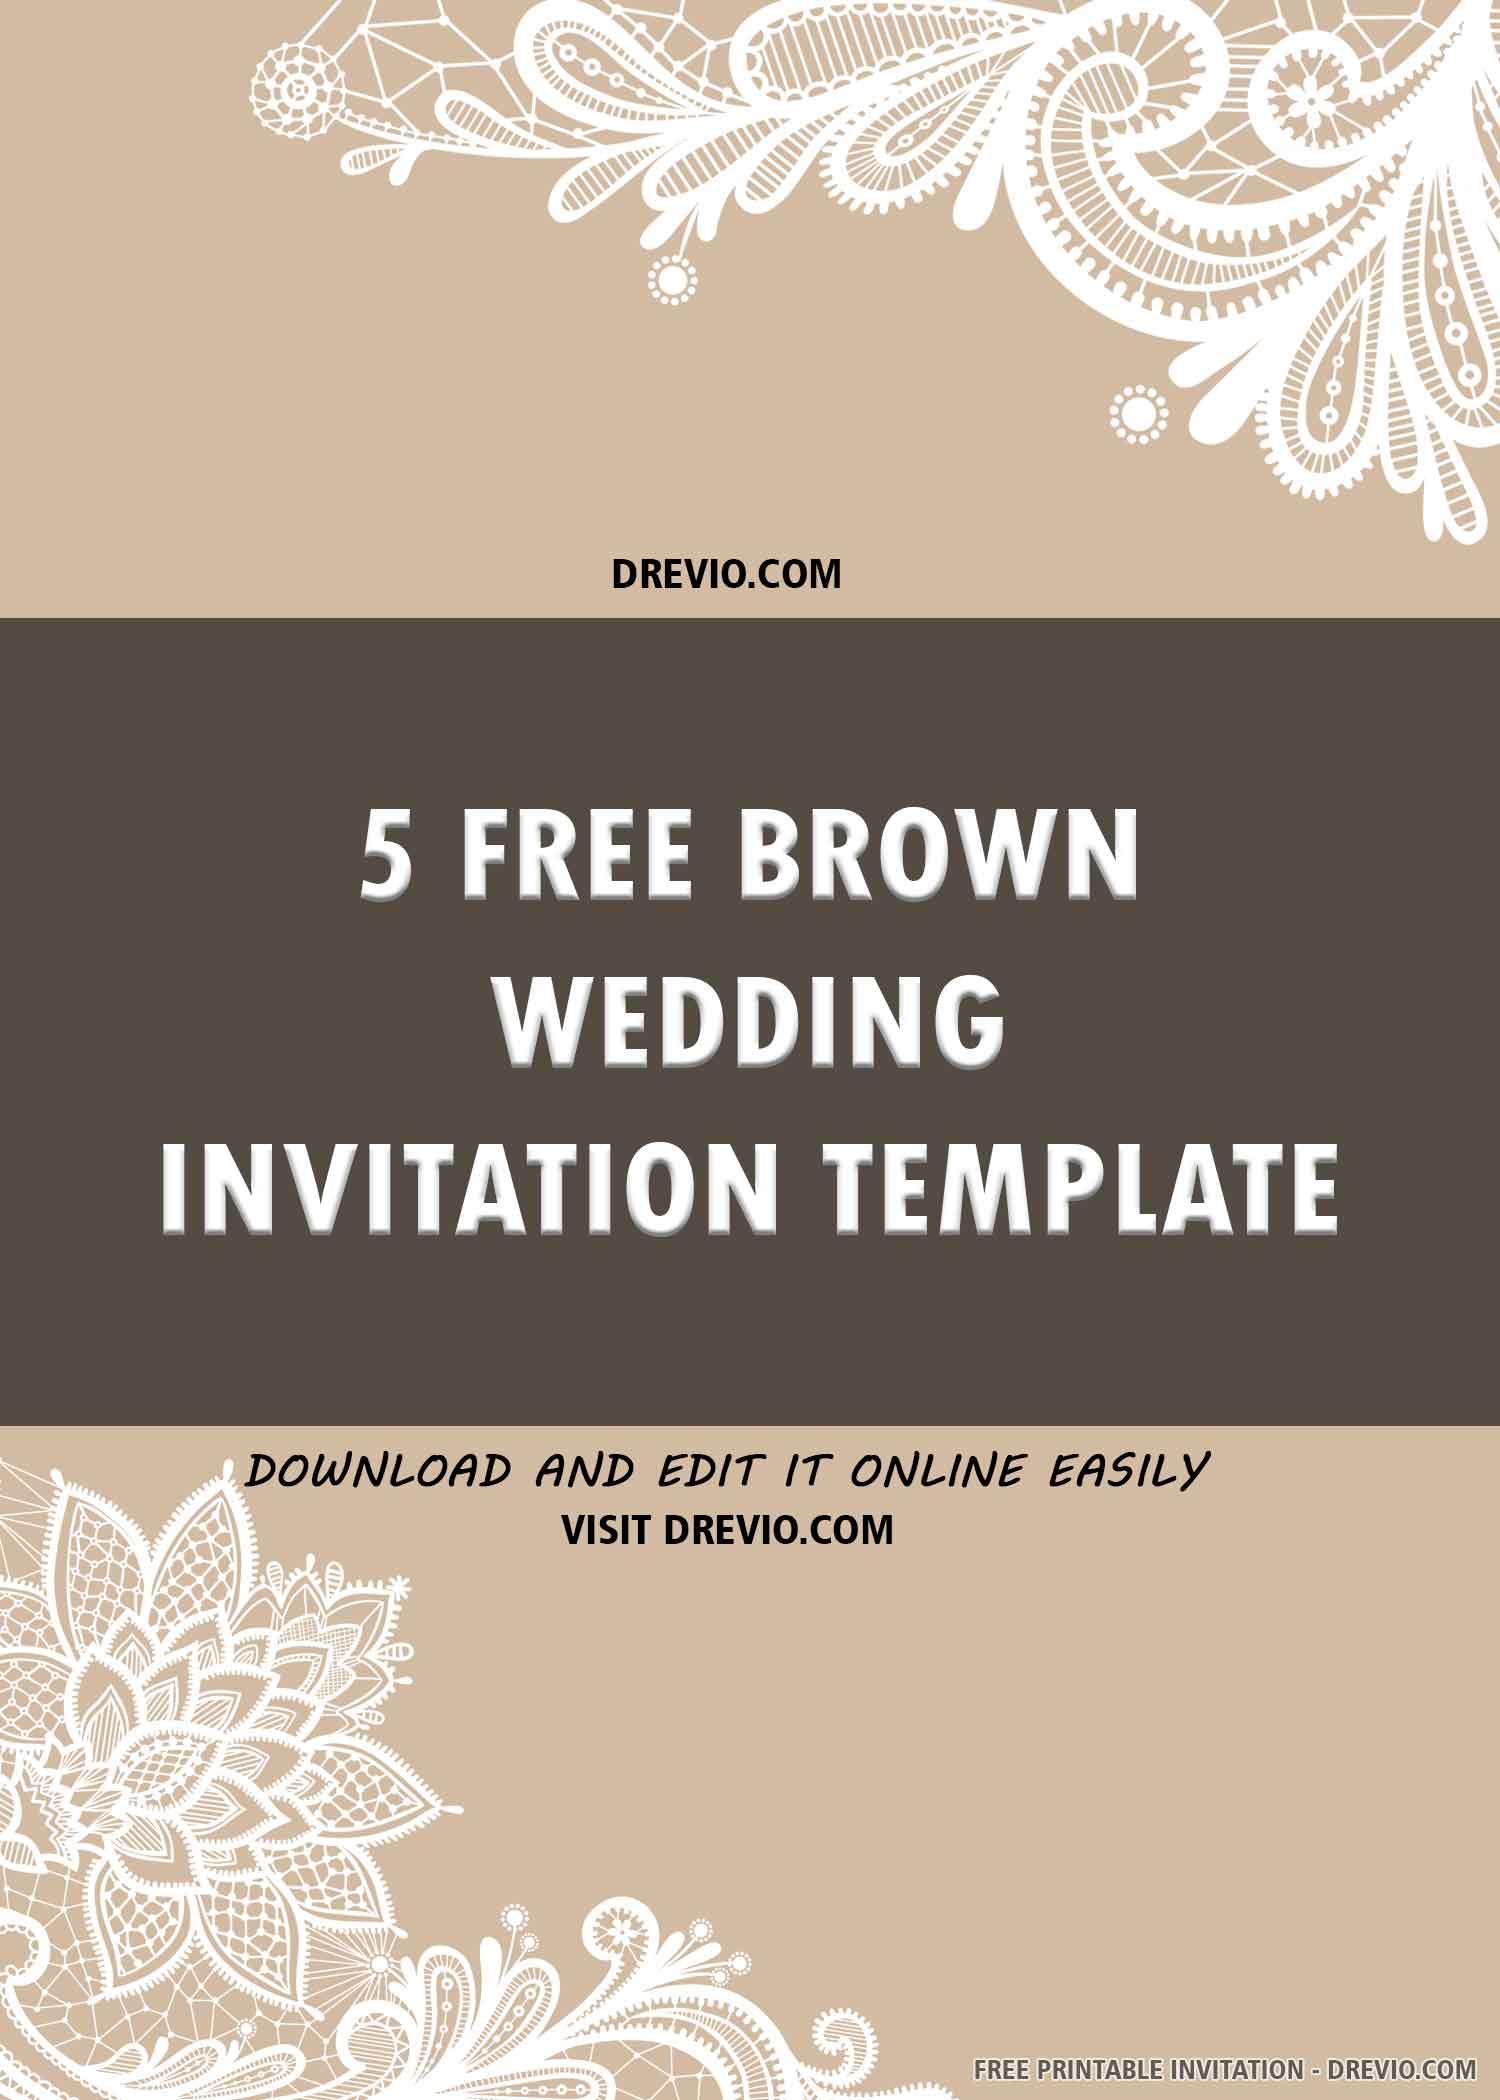 Free Printable Brown Themed Wedding Invitation